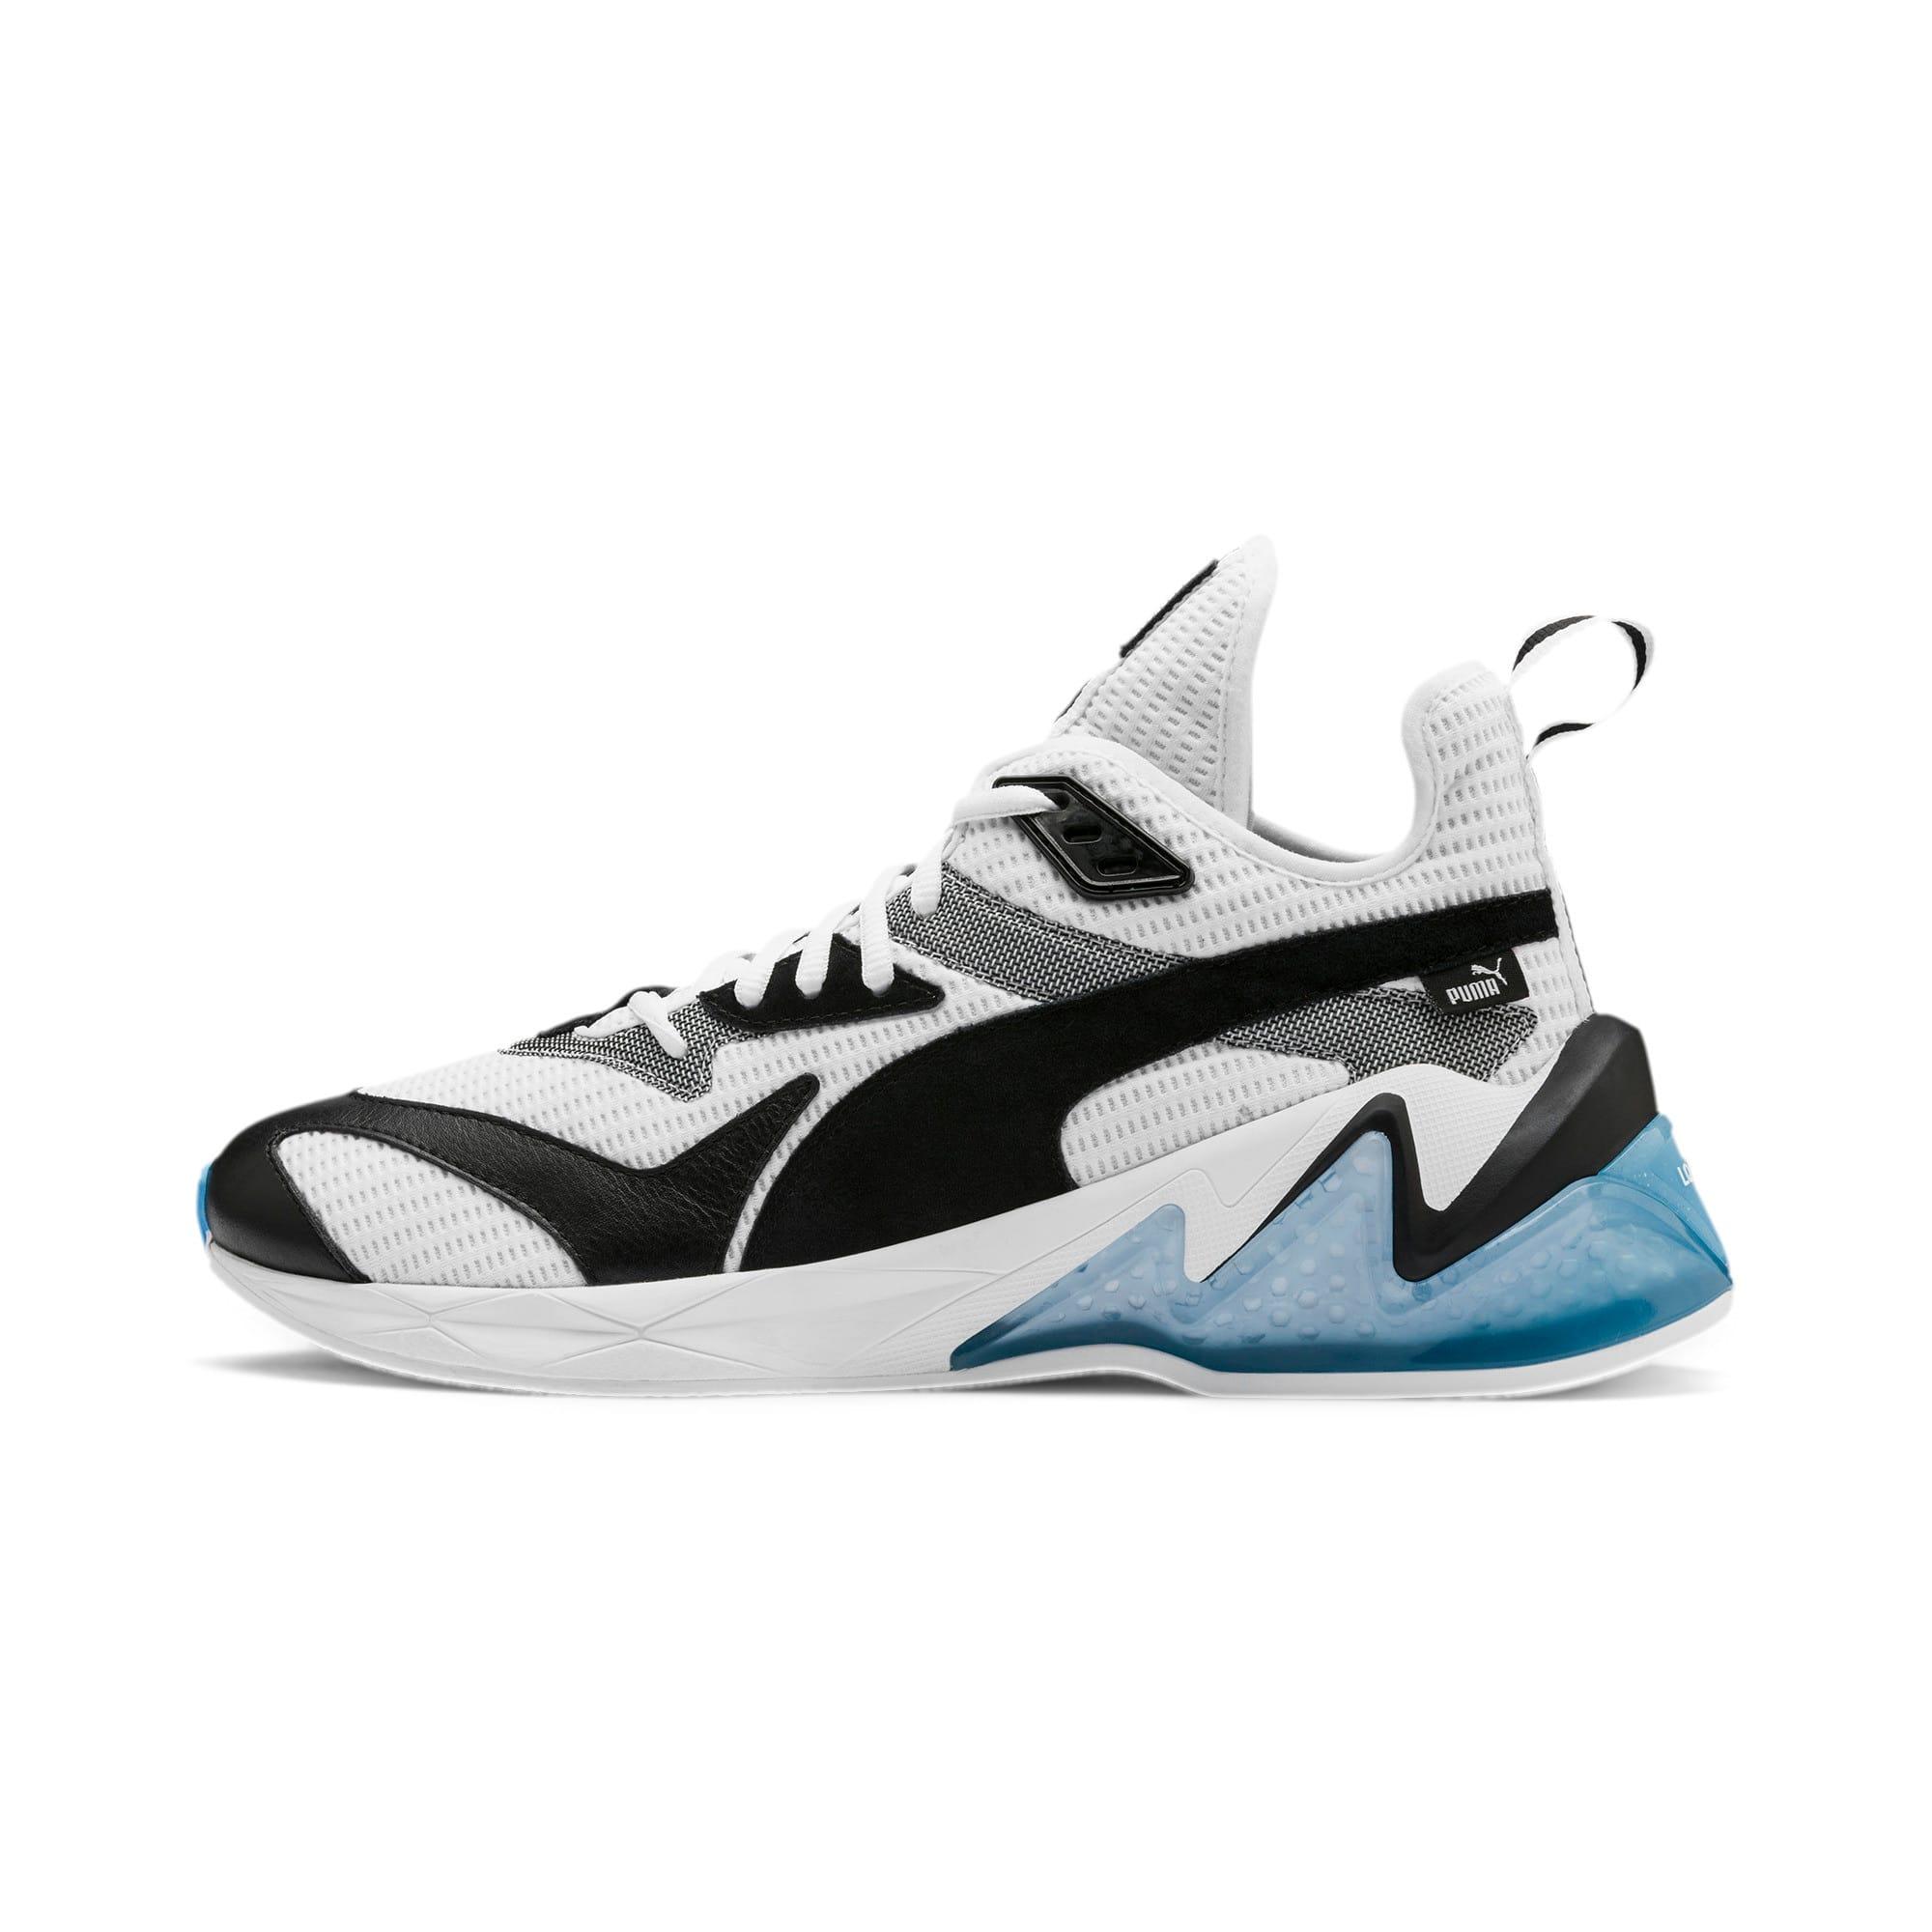 Thumbnail 1 of LQDCELL Origin Herren Sneaker, Puma White-Puma Black, medium